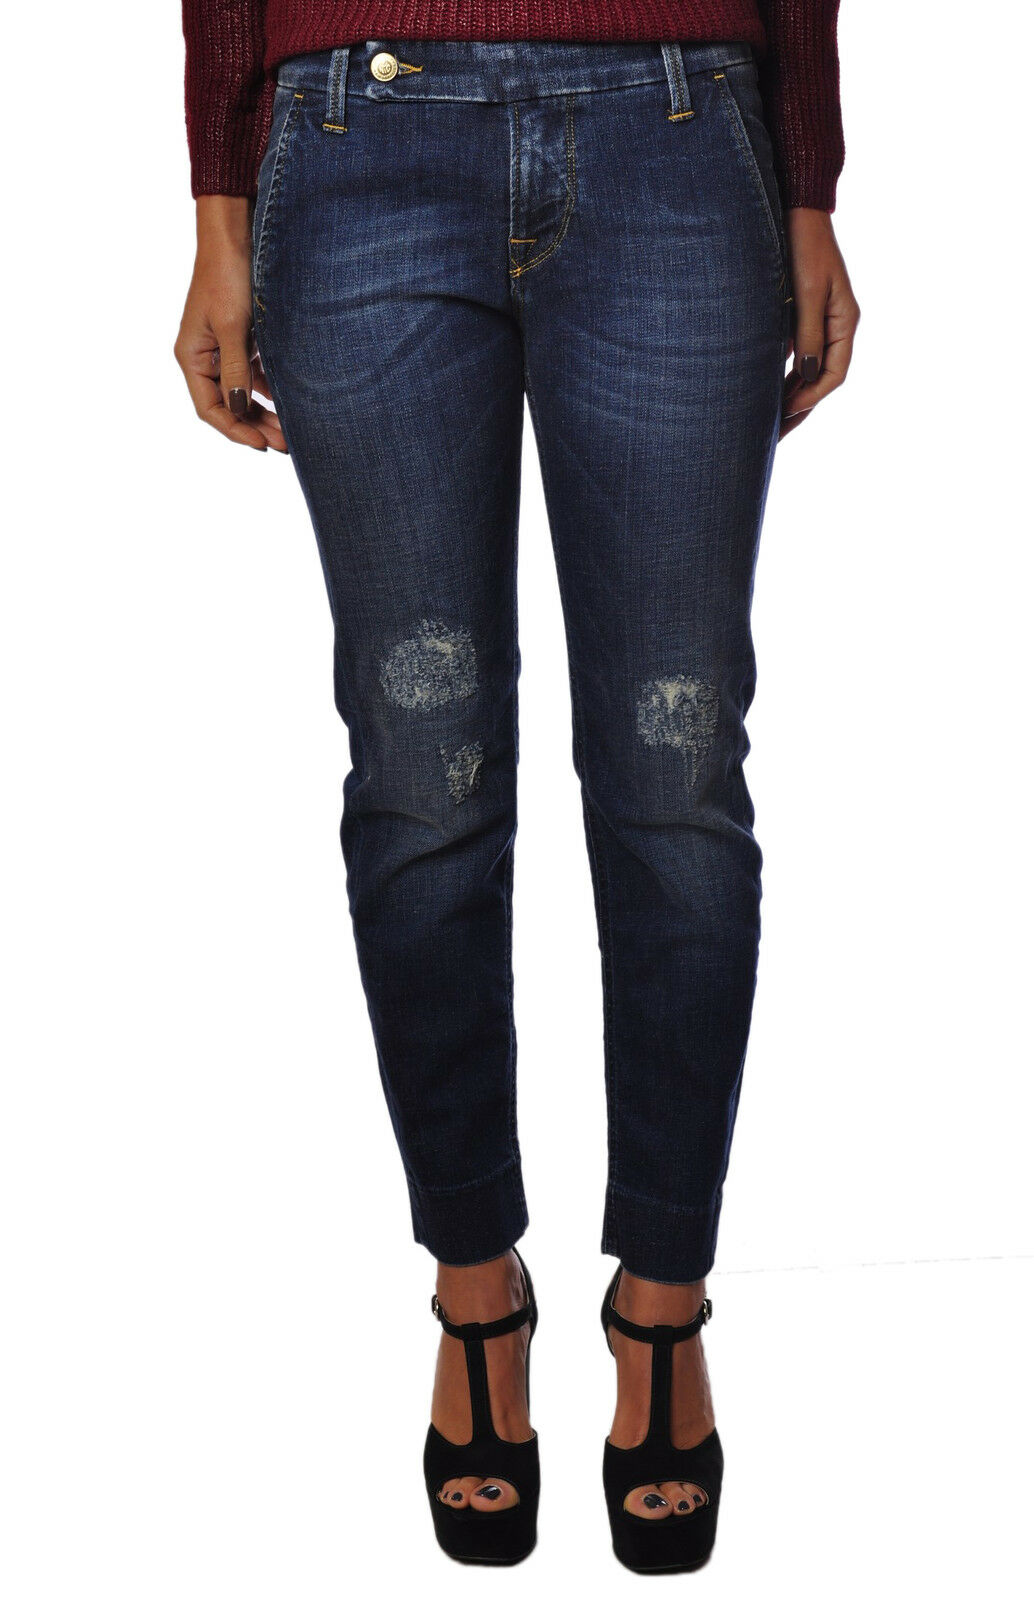 Truenyc  -  Pants - female - 26 - None - 230503B161820